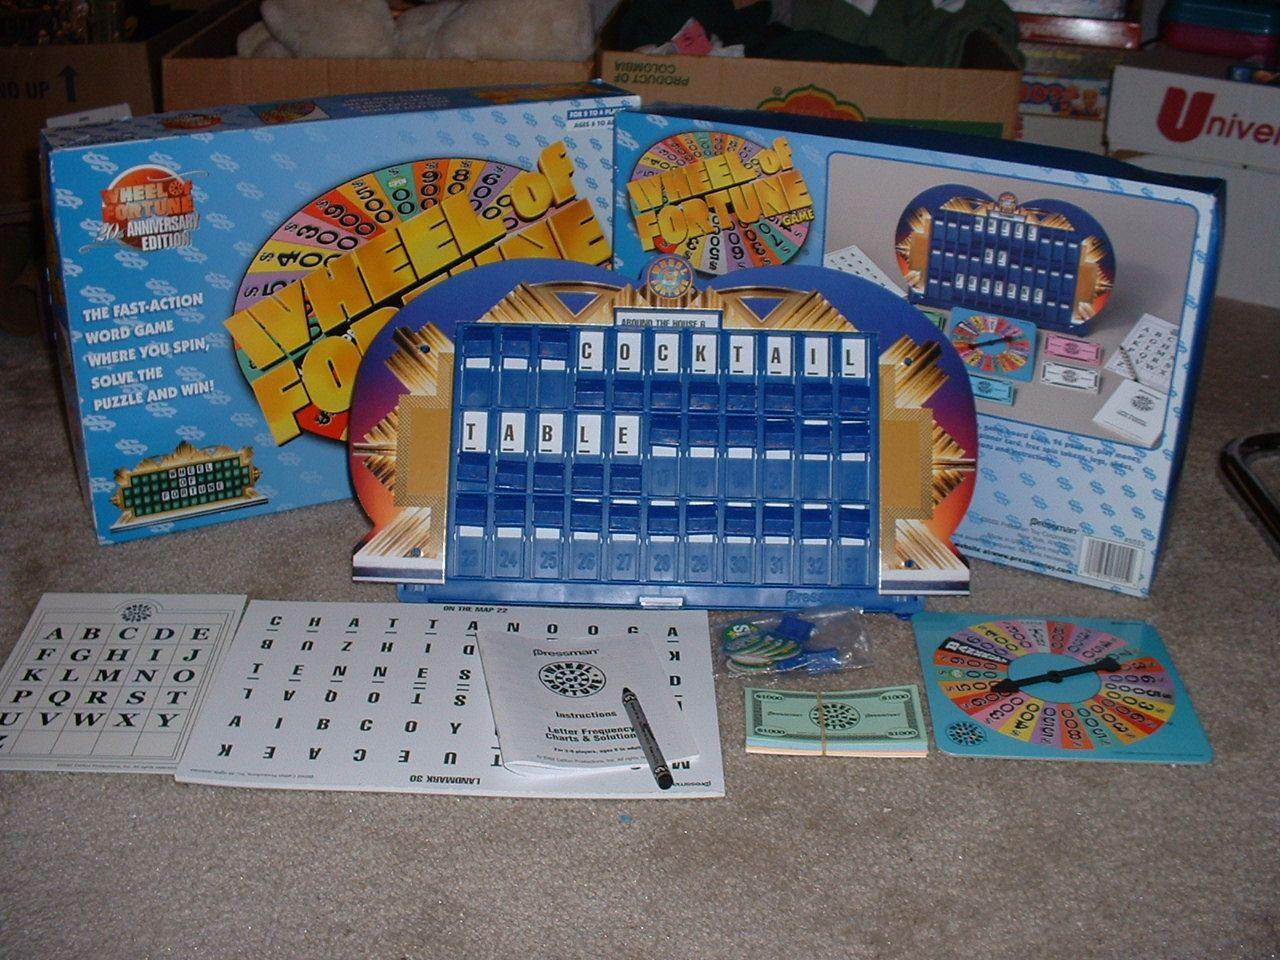 Wheel of Fortune Image BoardGameGeek Wheel of